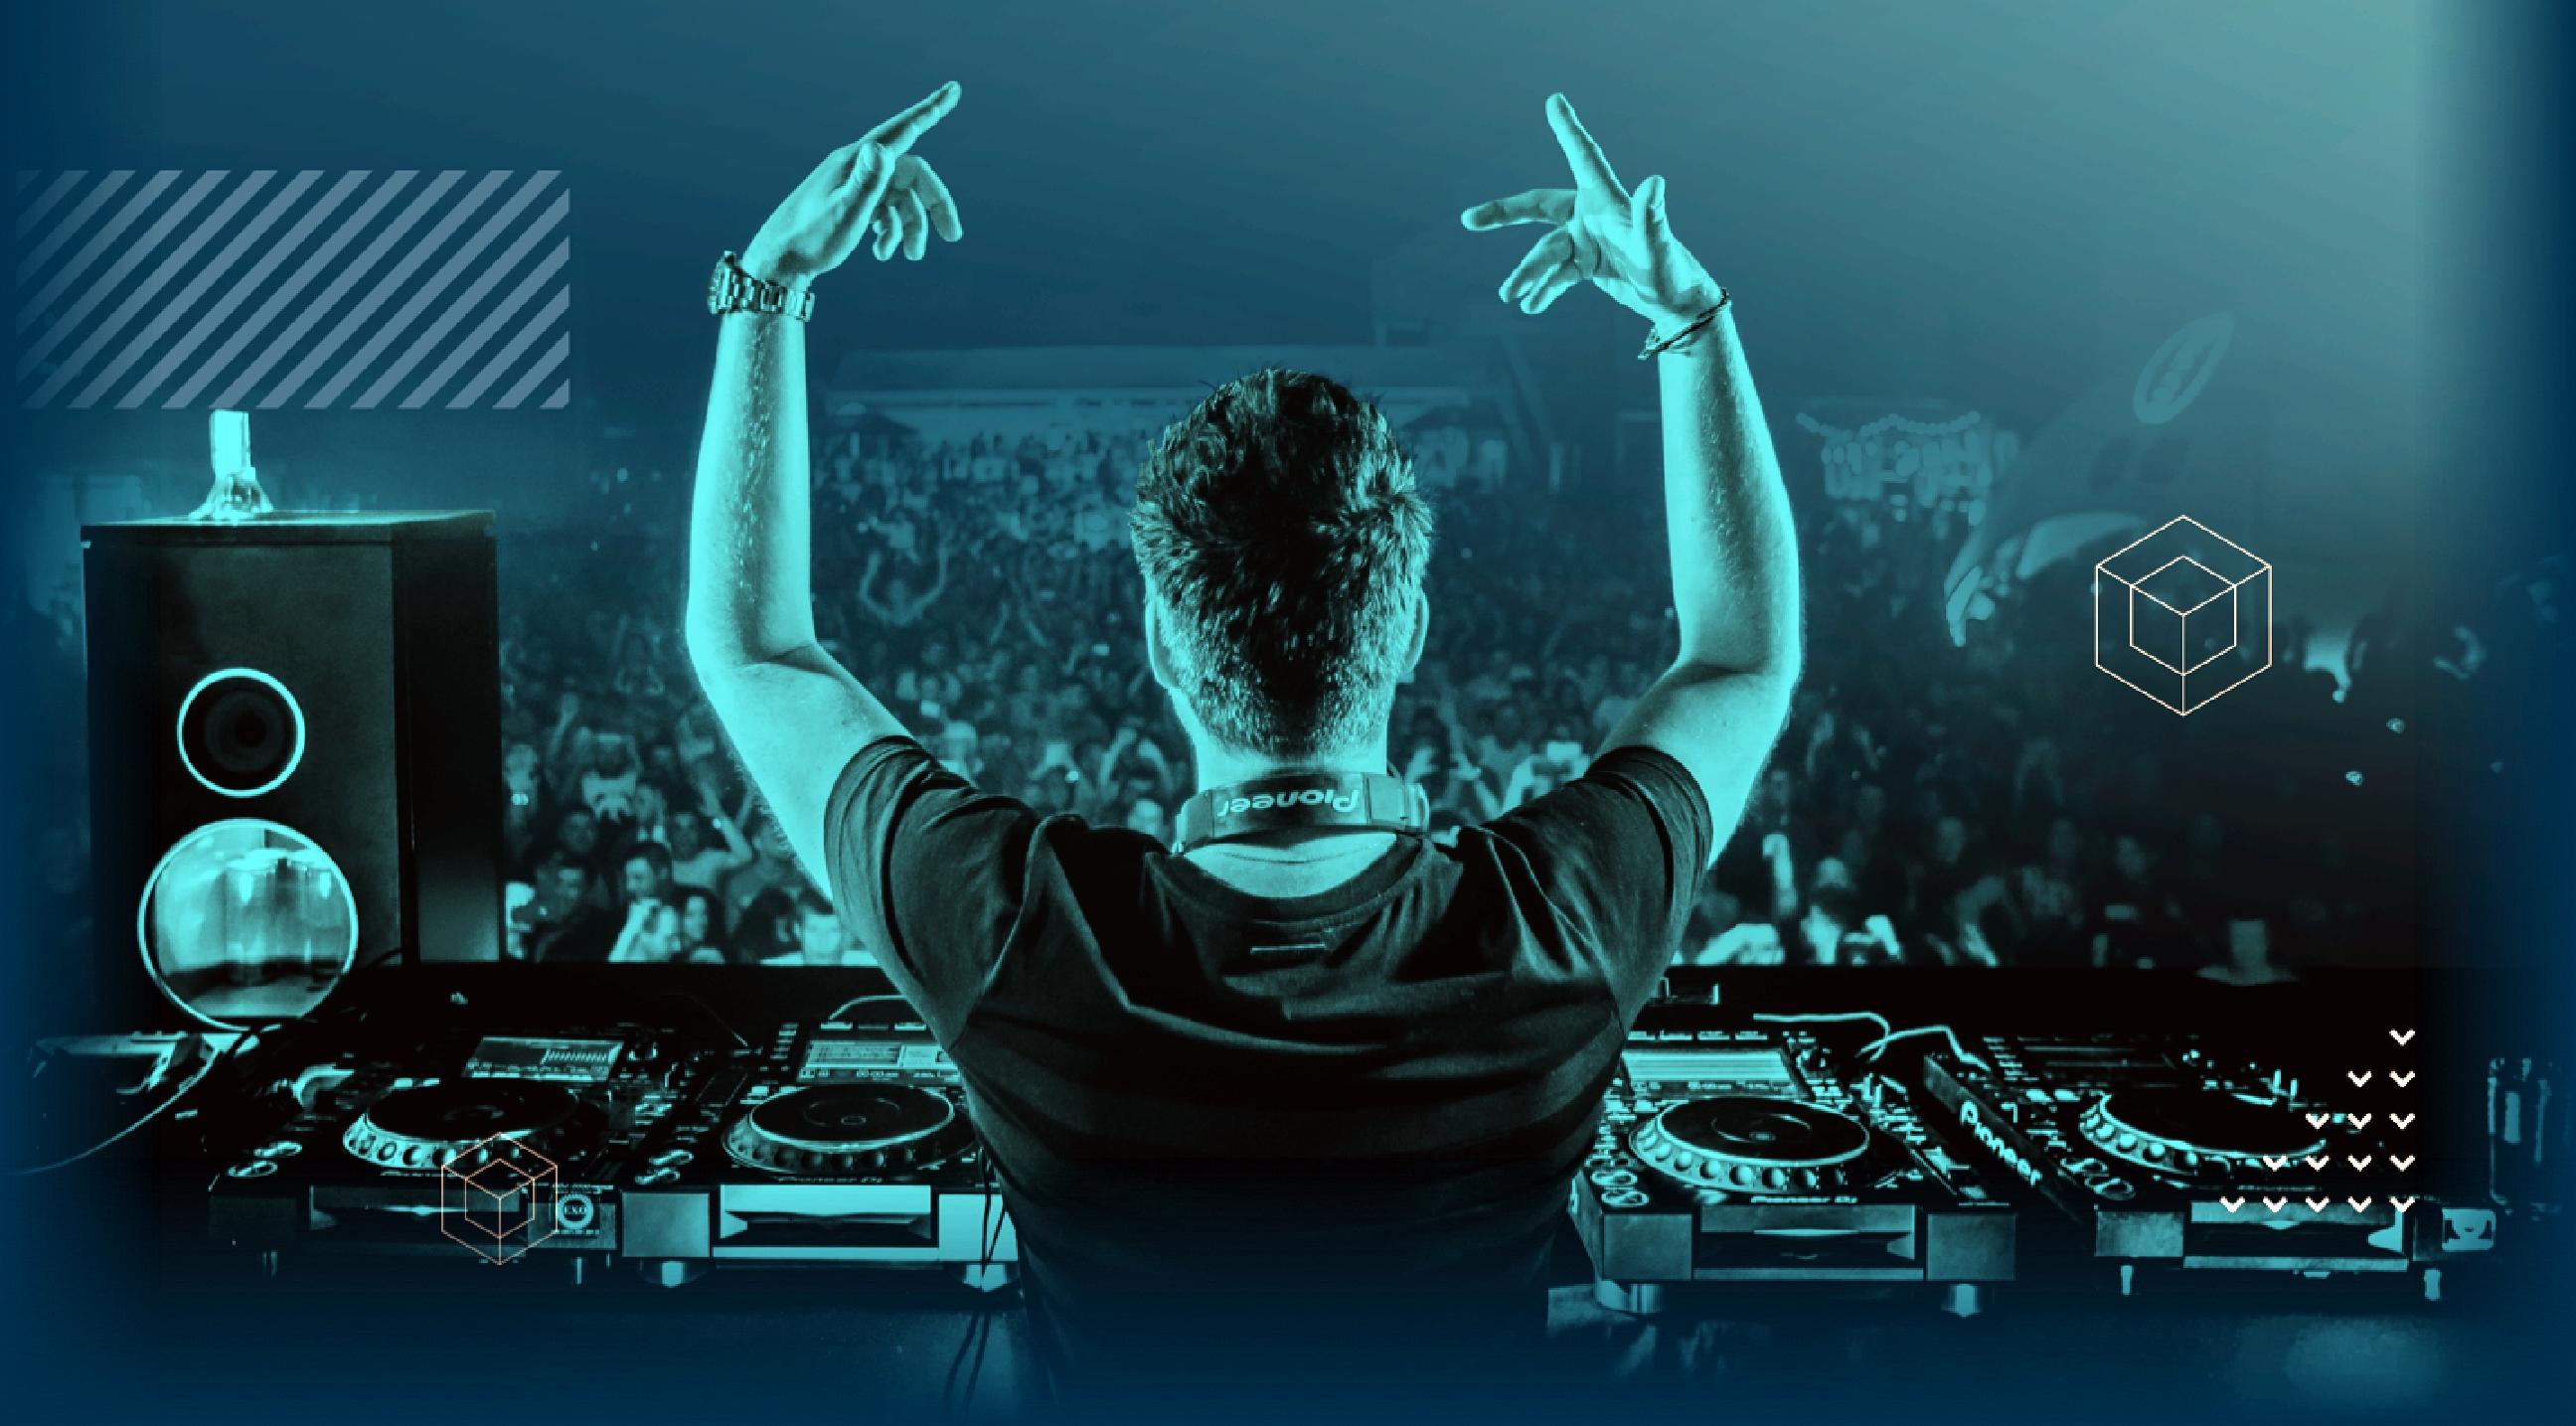 7 Fakta EMPC 2021, kontestasi musik elektronik Indonesia digelar lagi